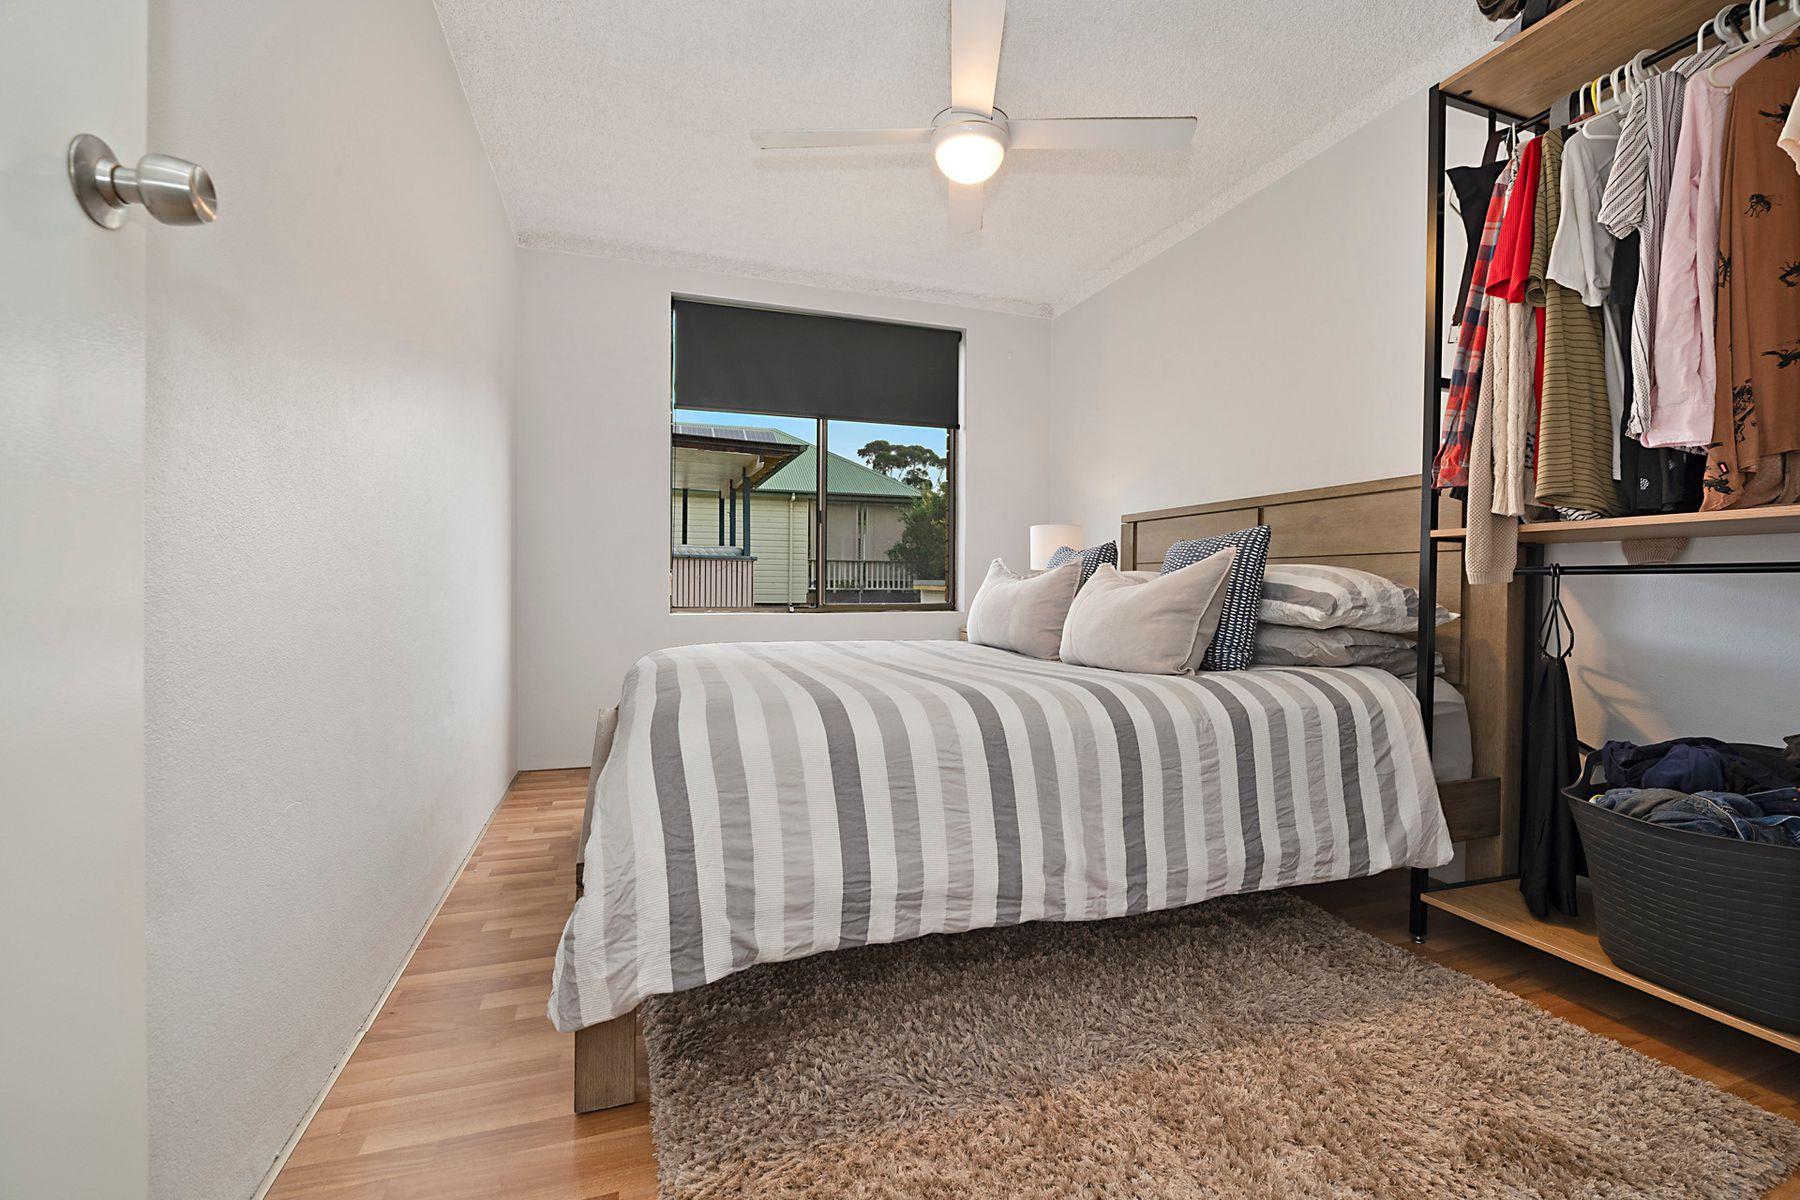 2/122 Morgan Street, Merewether, NSW 2291